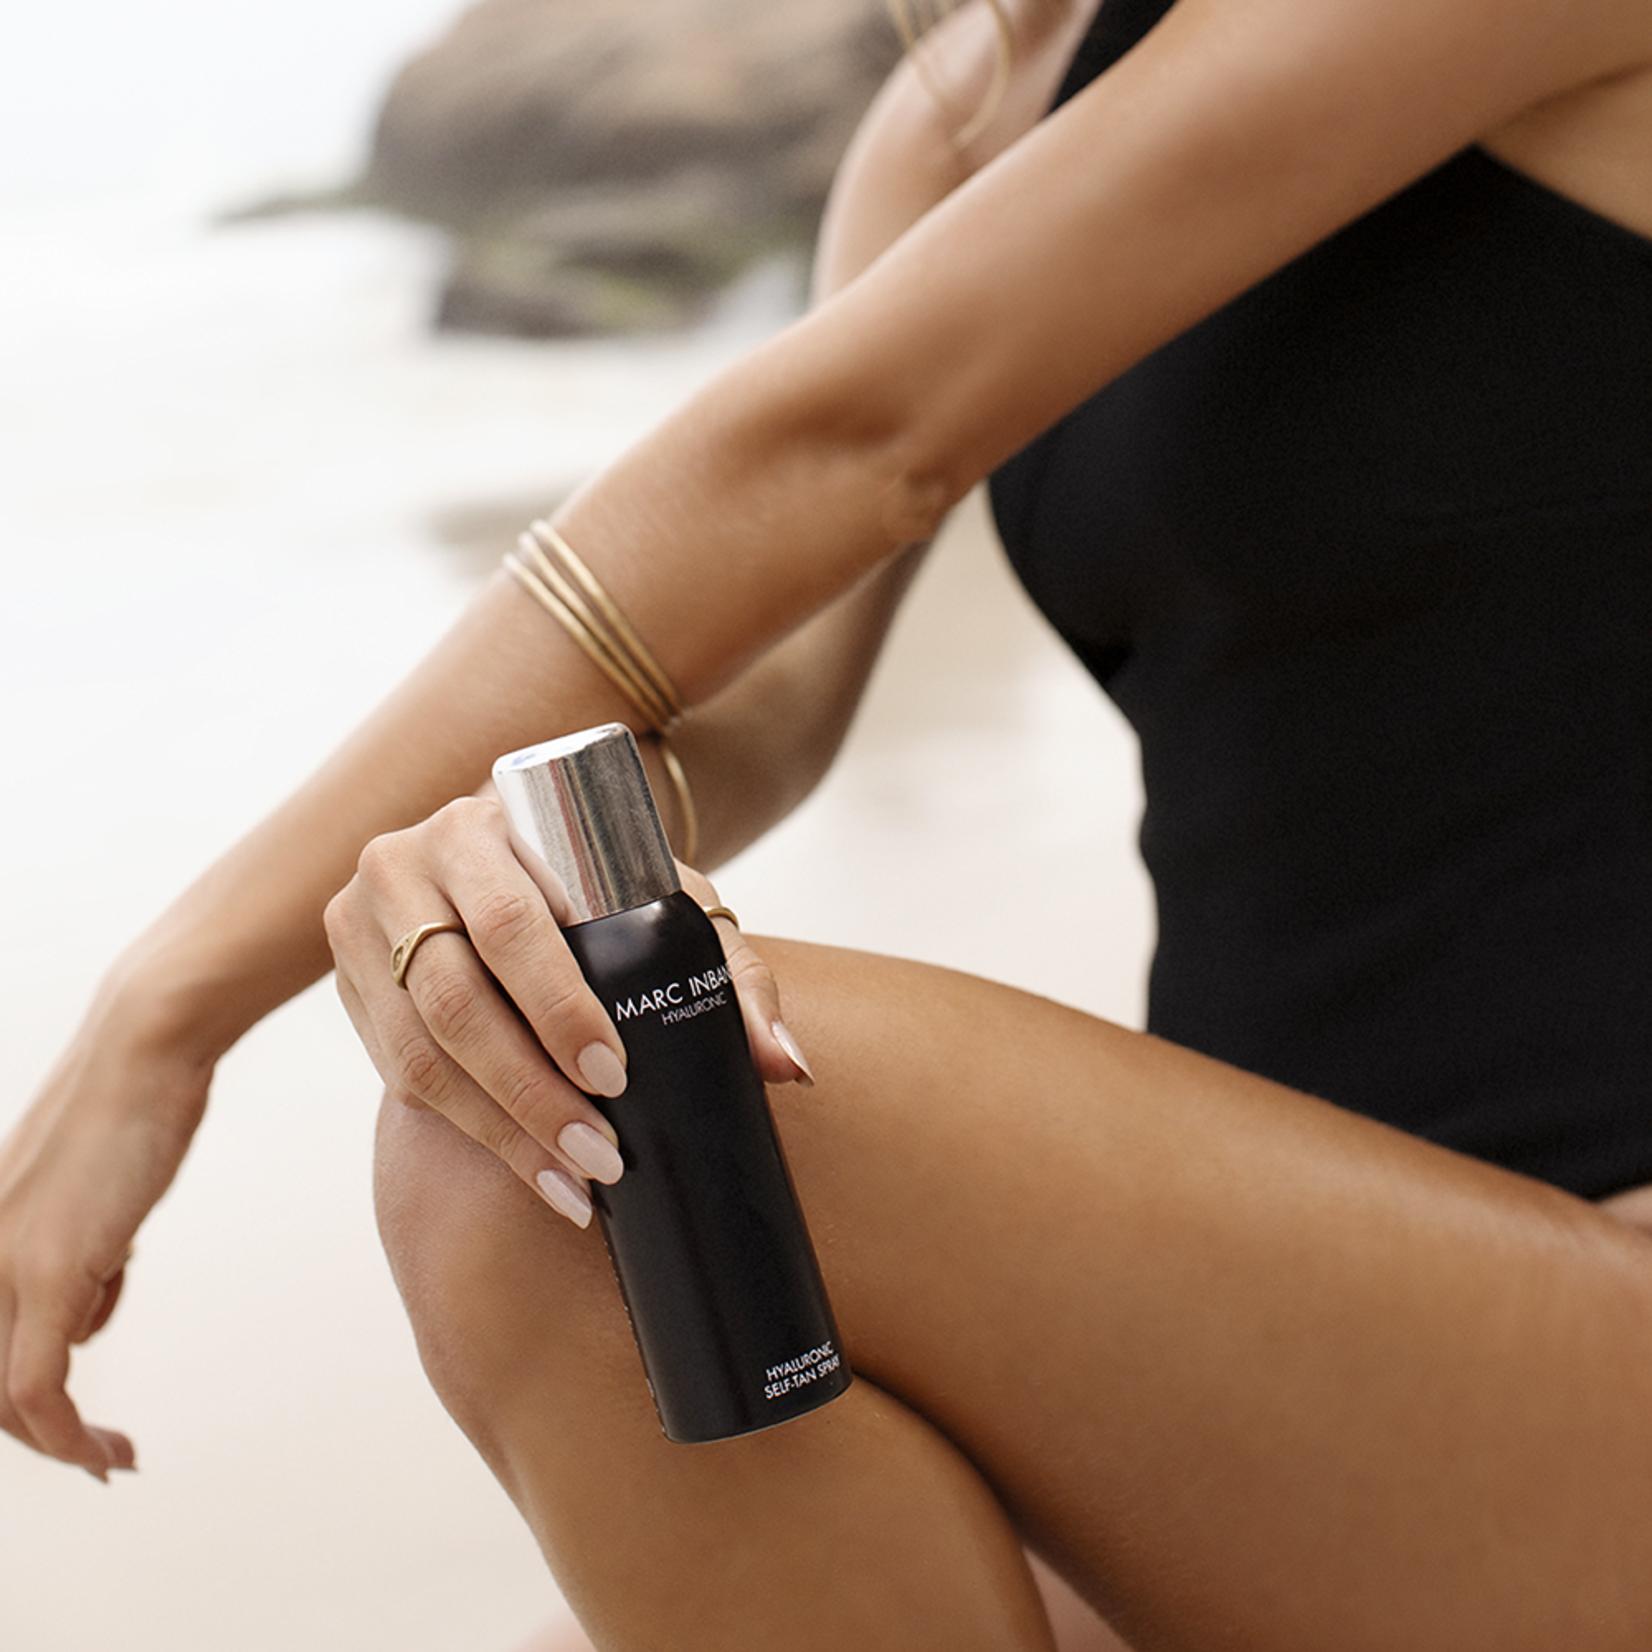 MARC INBANE MARC INBANE hyaluronic self-tan spray 100ml